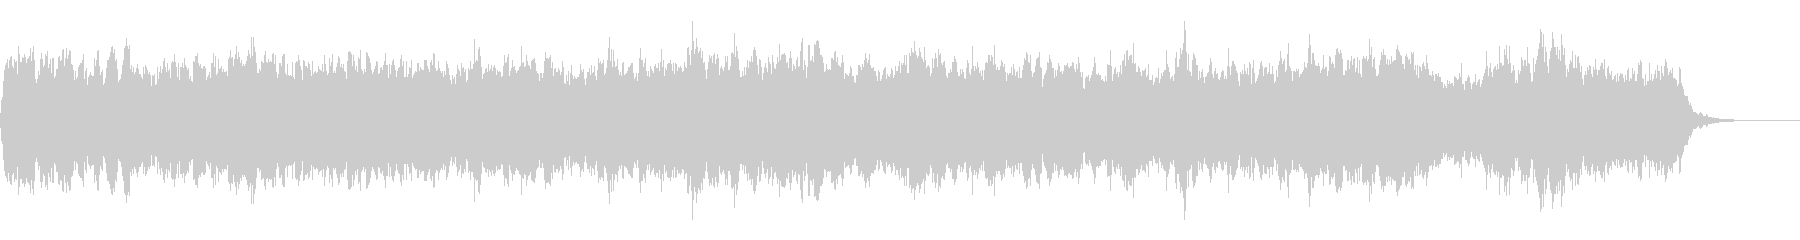 Bach Minuet オーケストラ風の未再生の波形